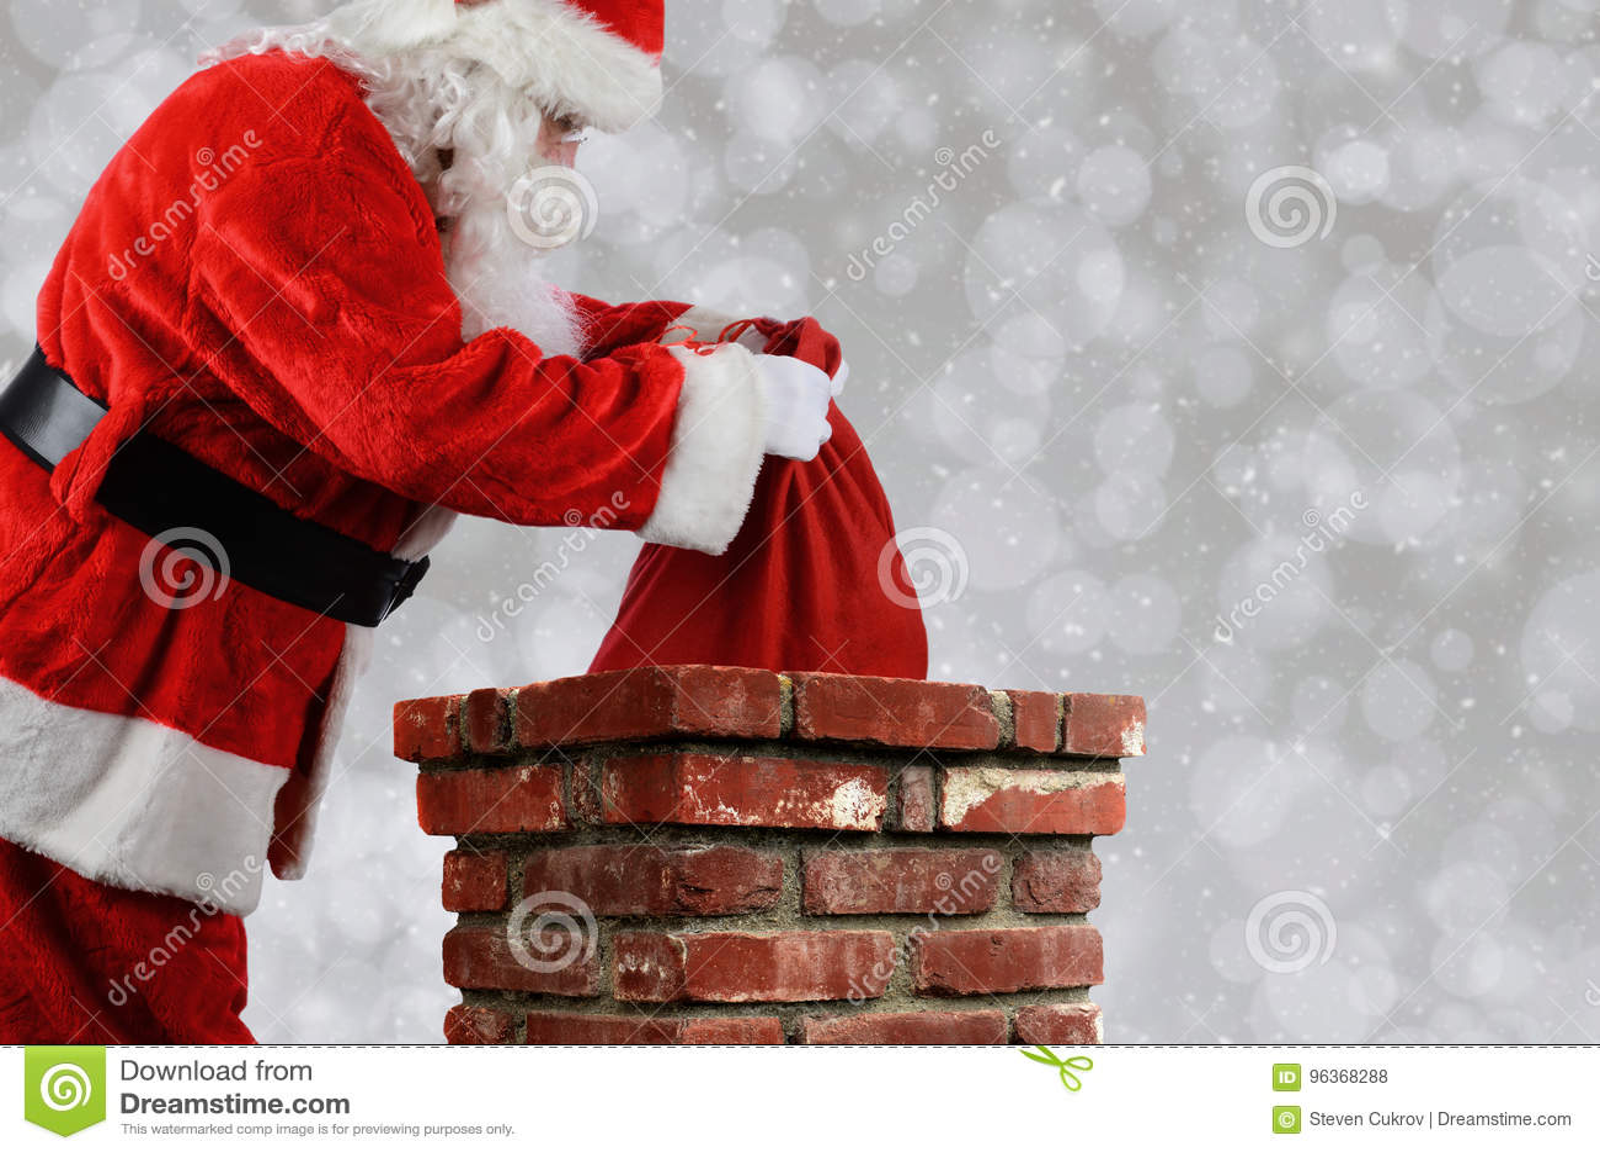 Santa Claus Putting Bag into Chimney